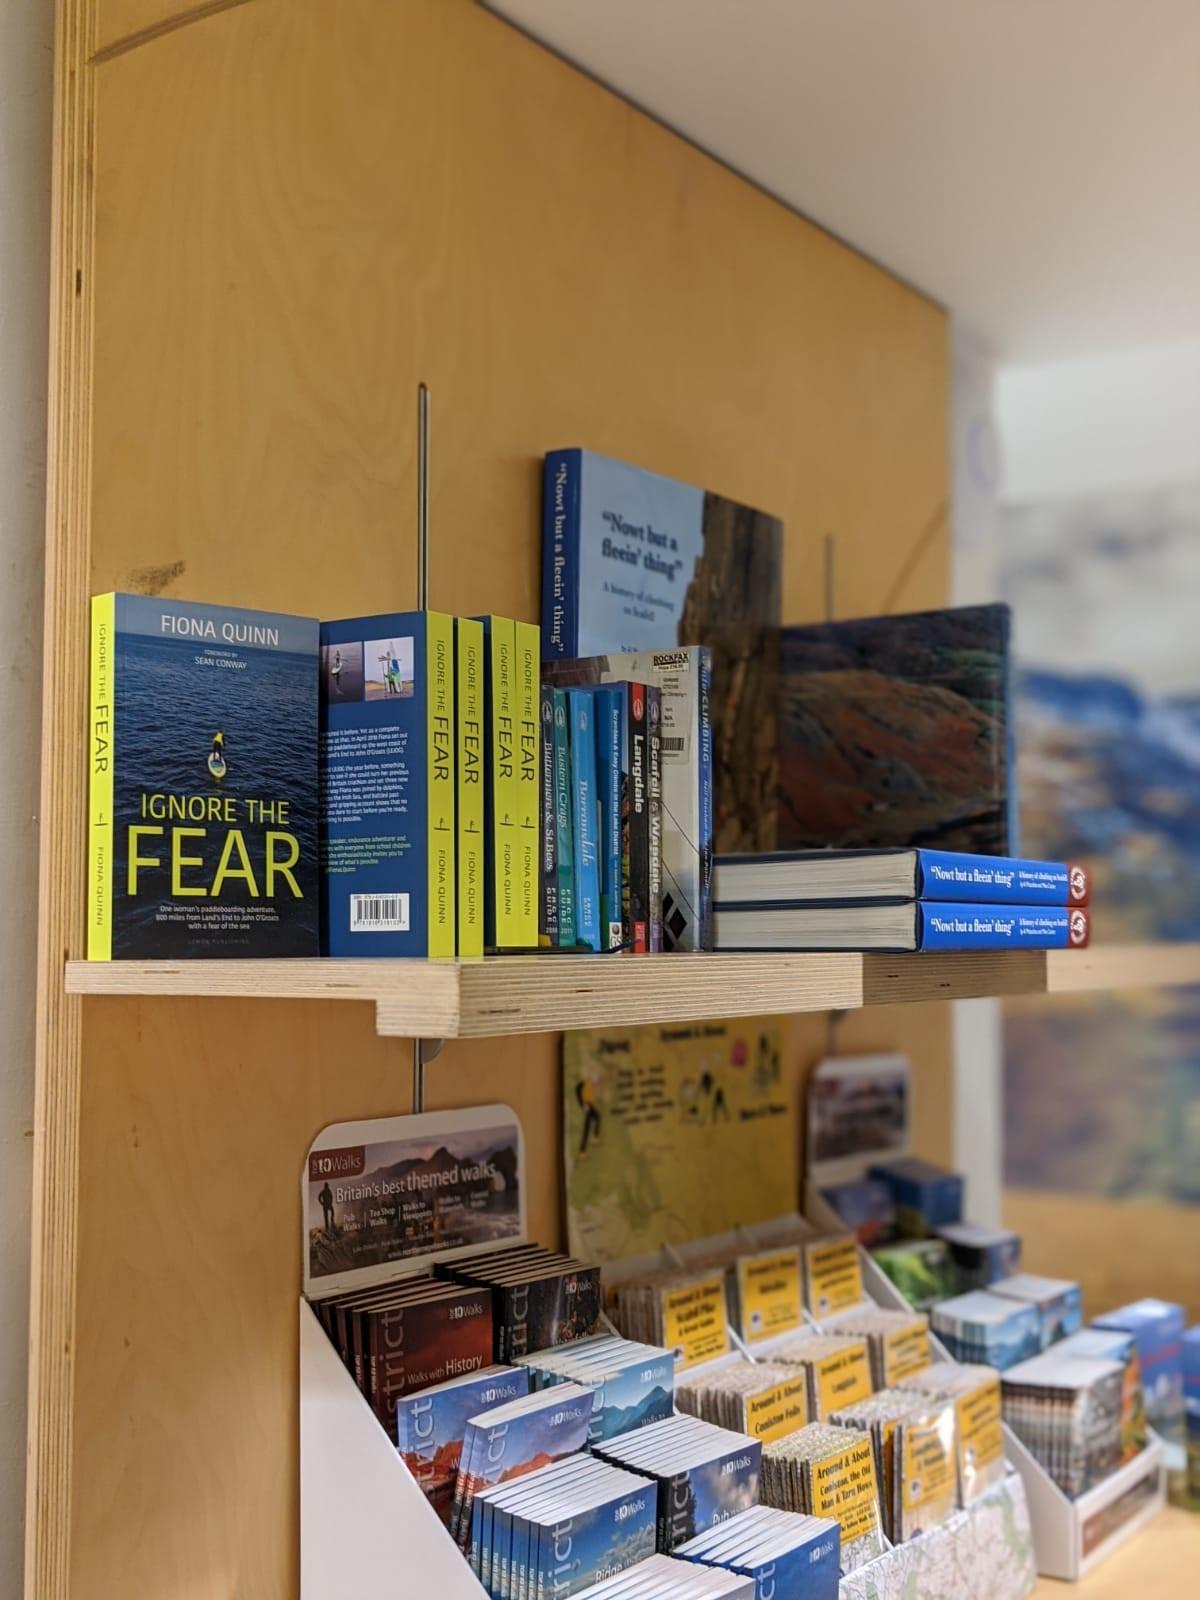 Ignore the fear book